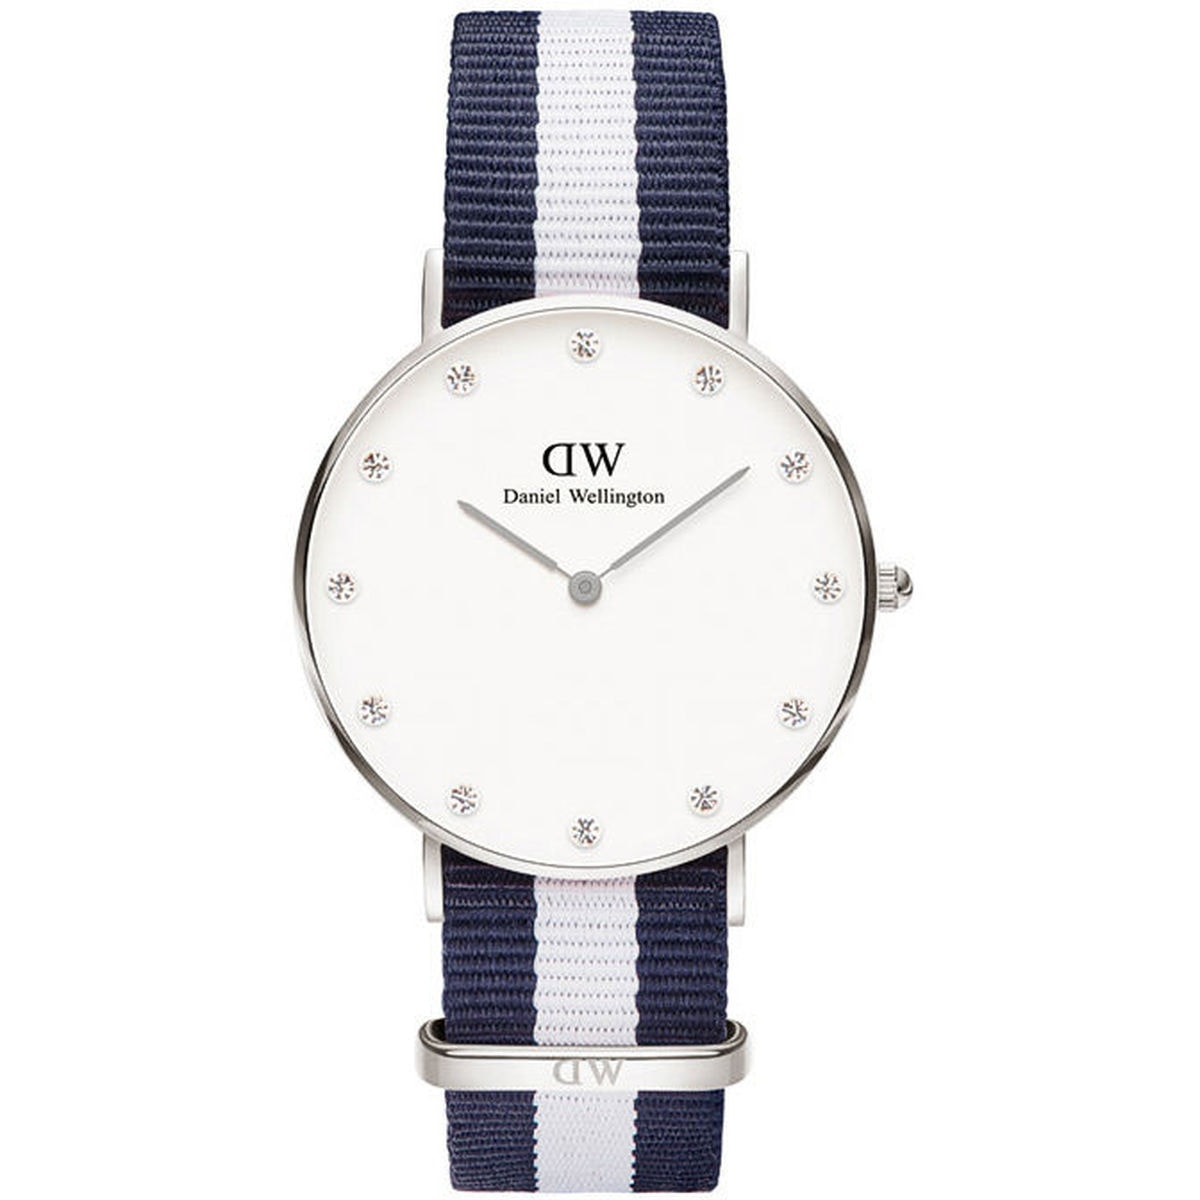 Zegarek Daniel Wellington 0963DW - Oryginalny